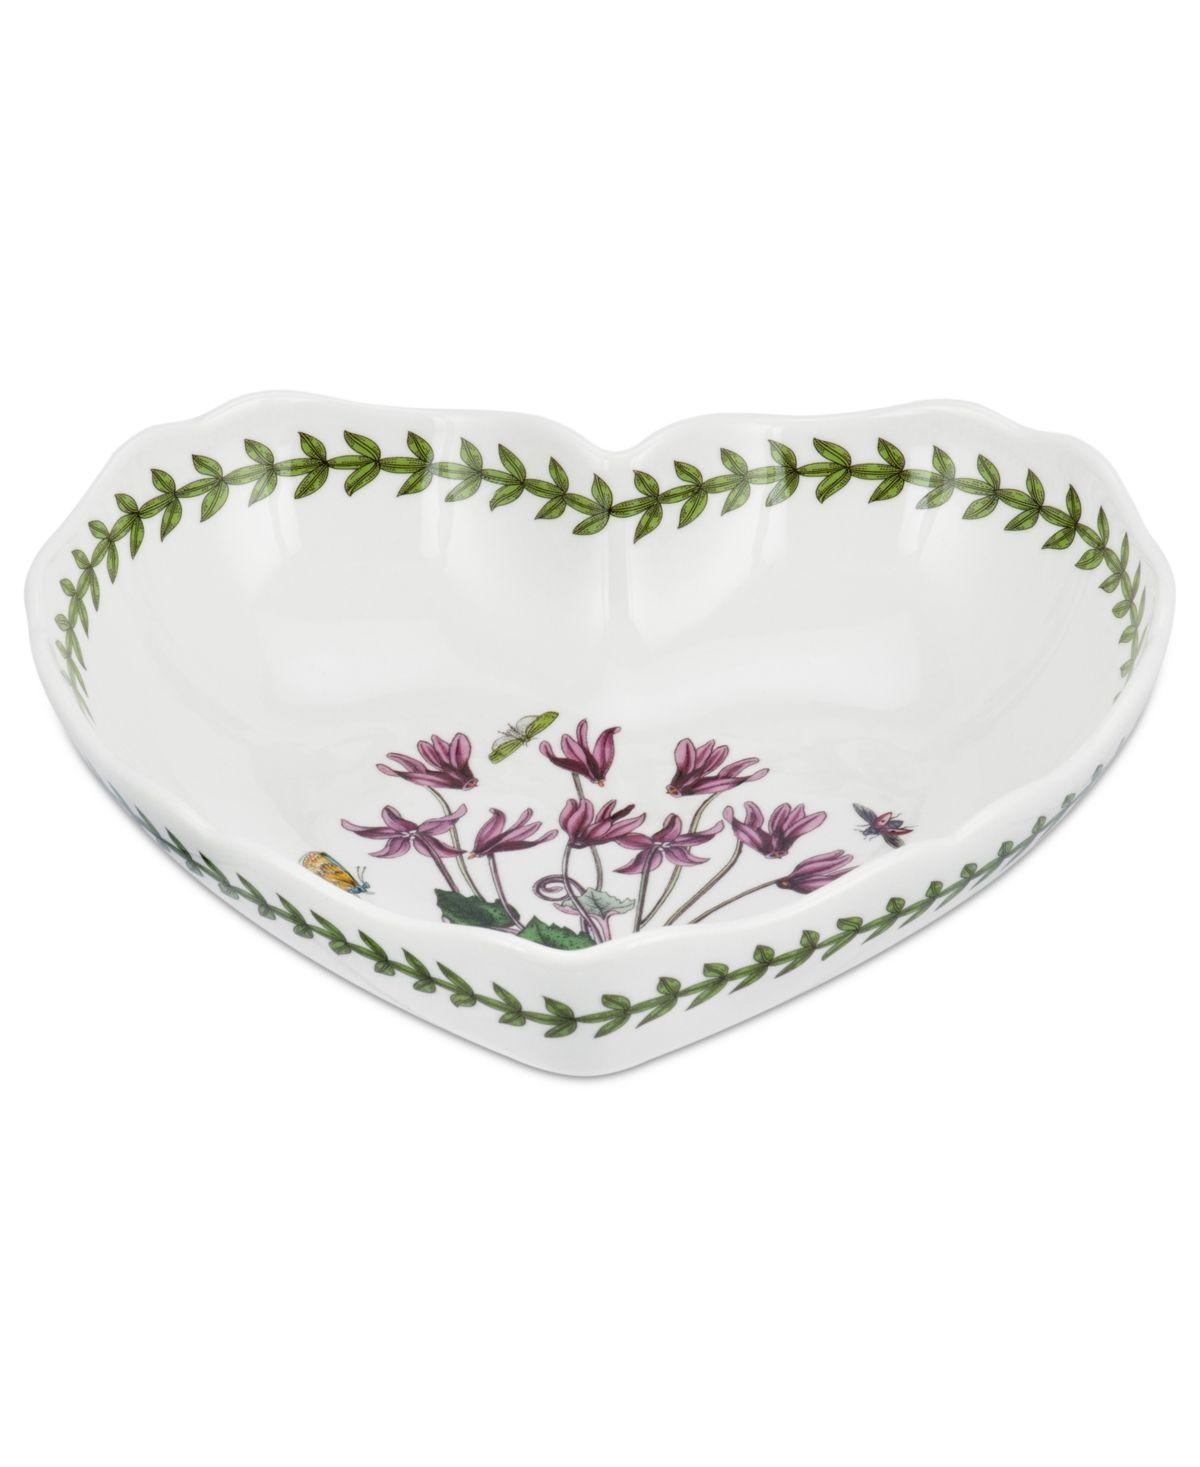 Portmeirion Dinnerware Botanic Garden Gift Collection Created